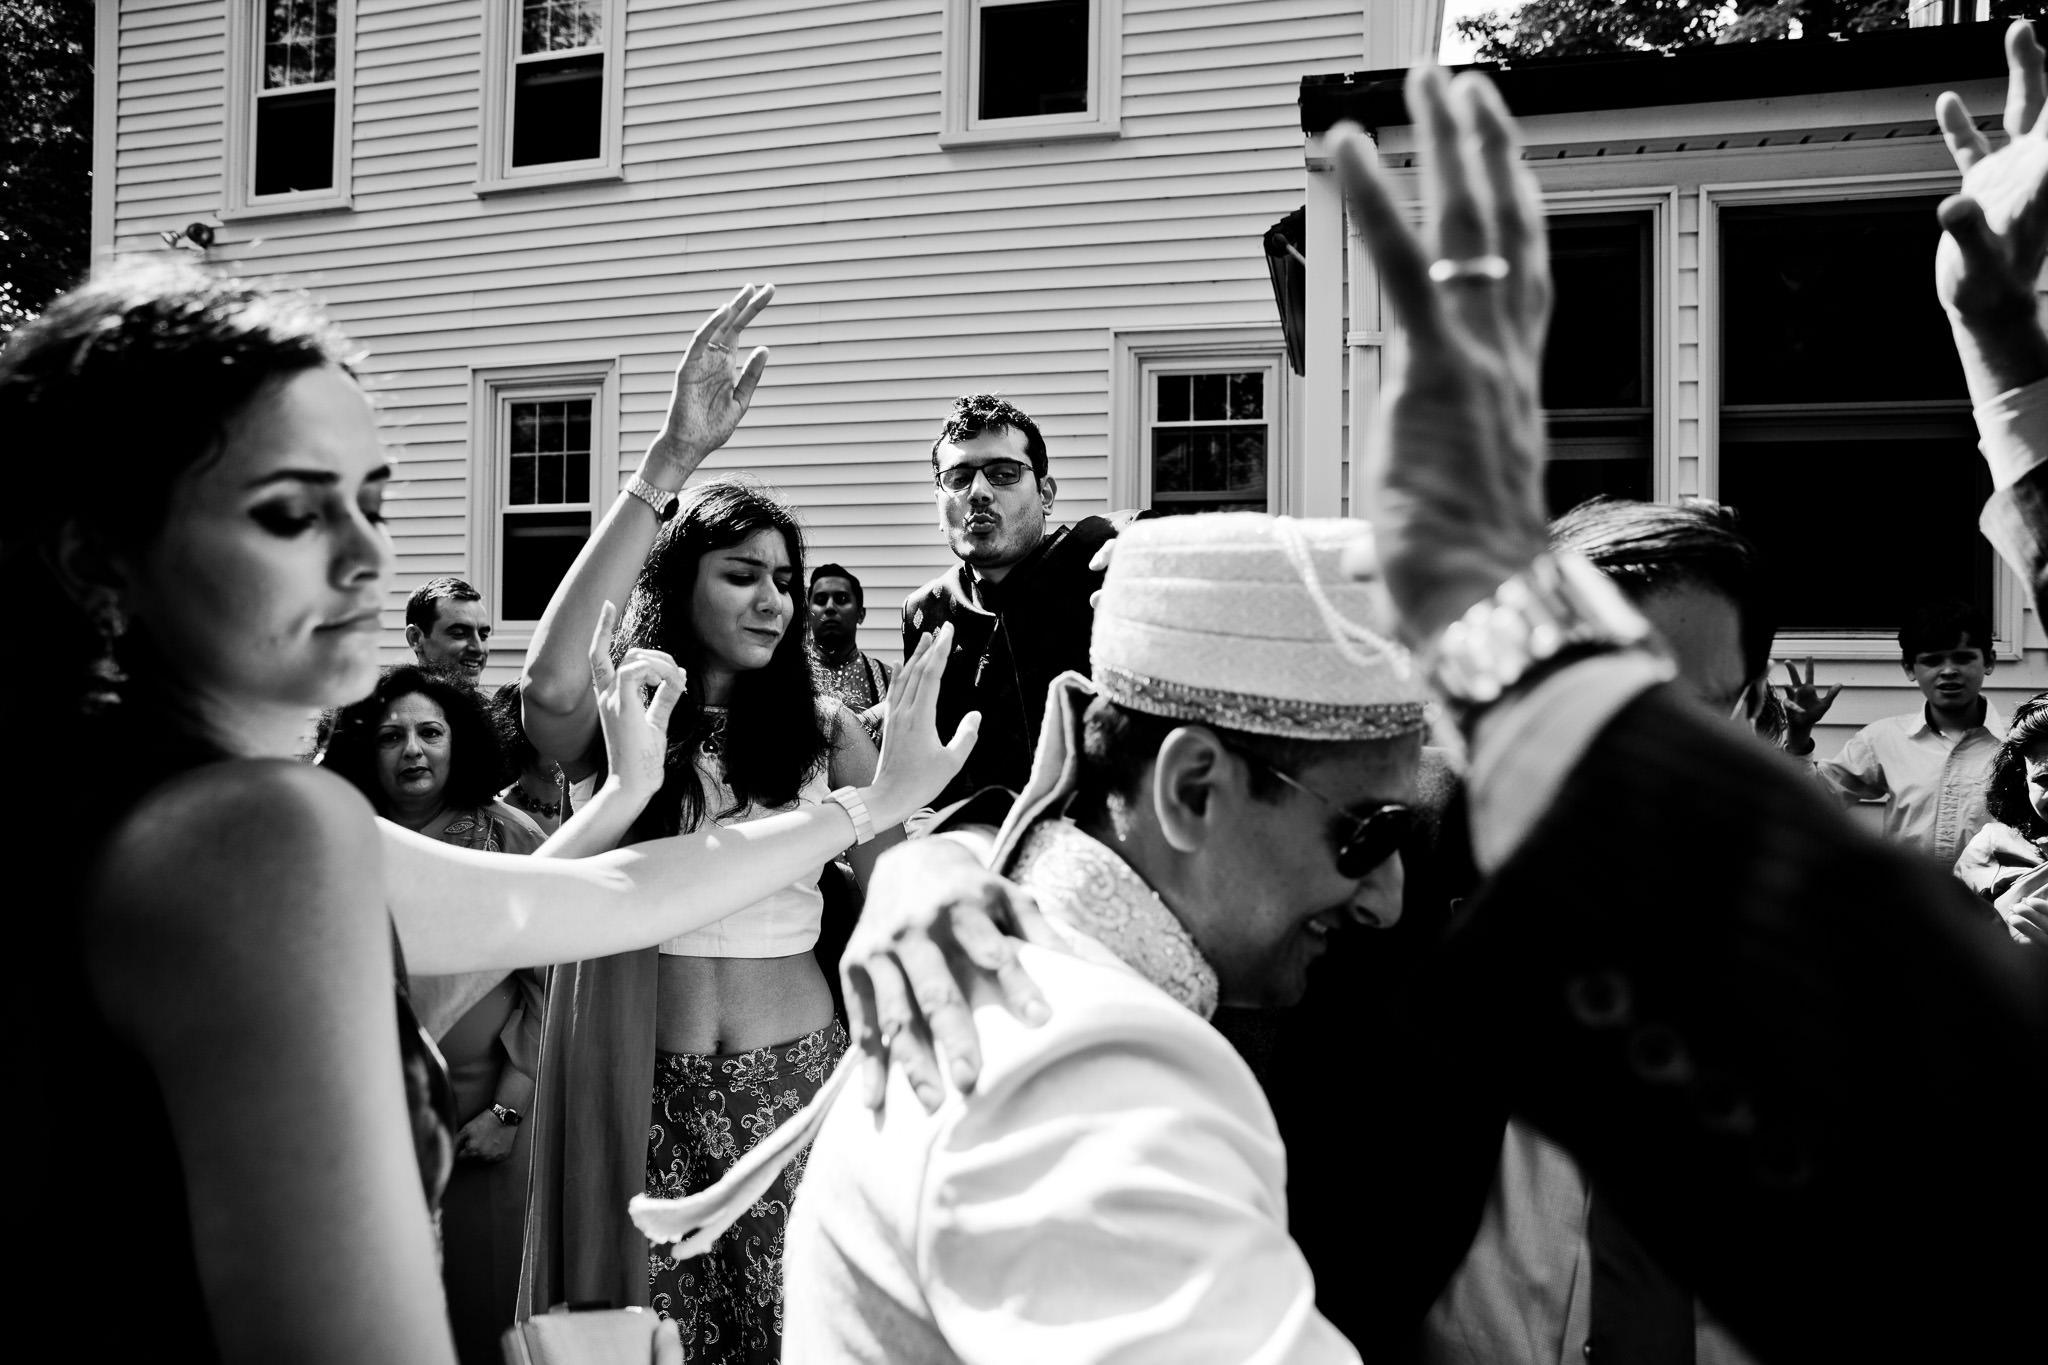 030_Canada-documentary-wedding-photograp